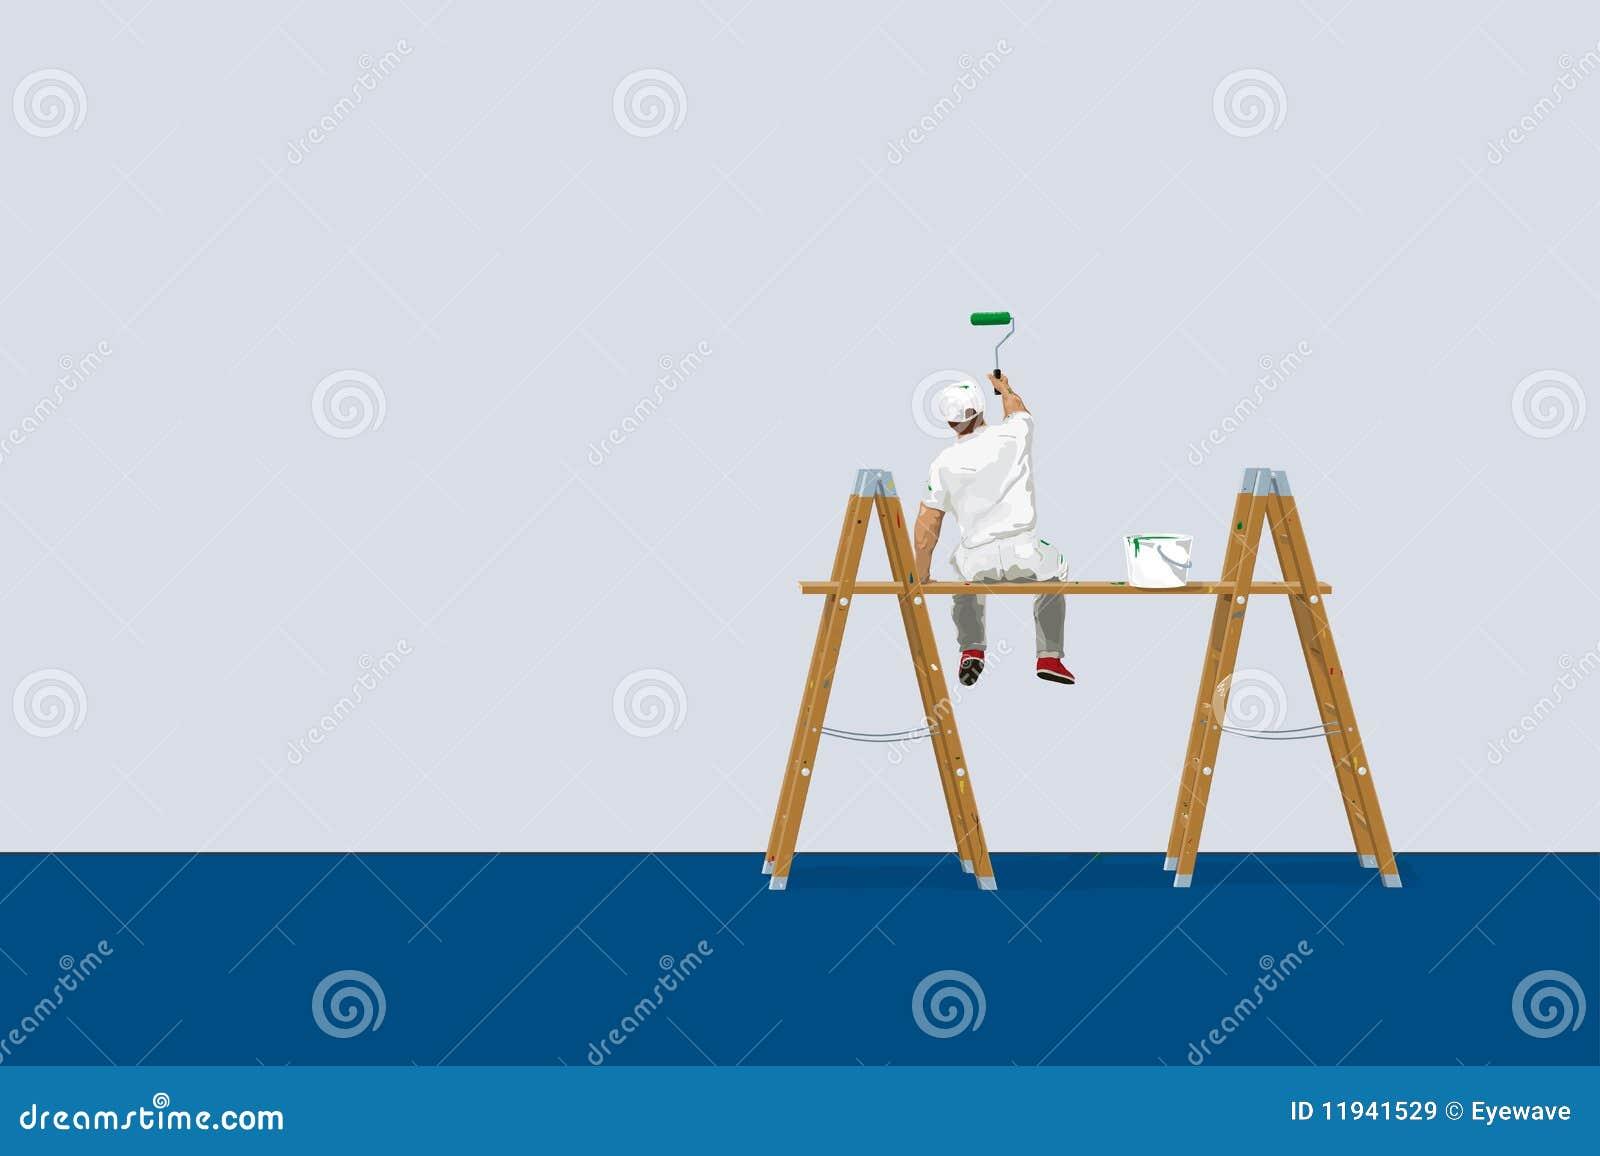 Schilder op ladders